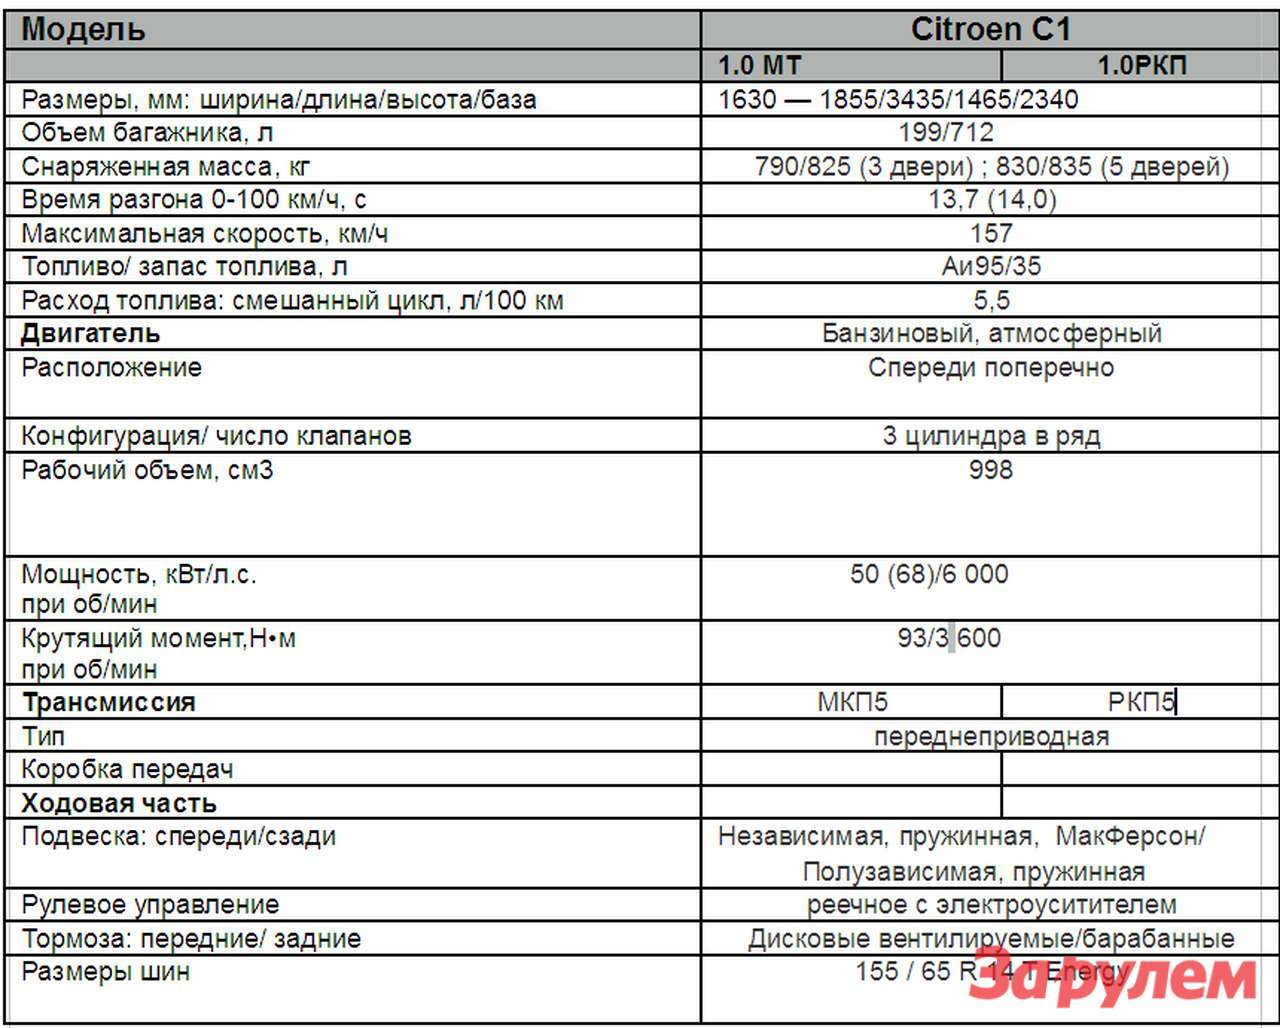 Citroen С1Technical data